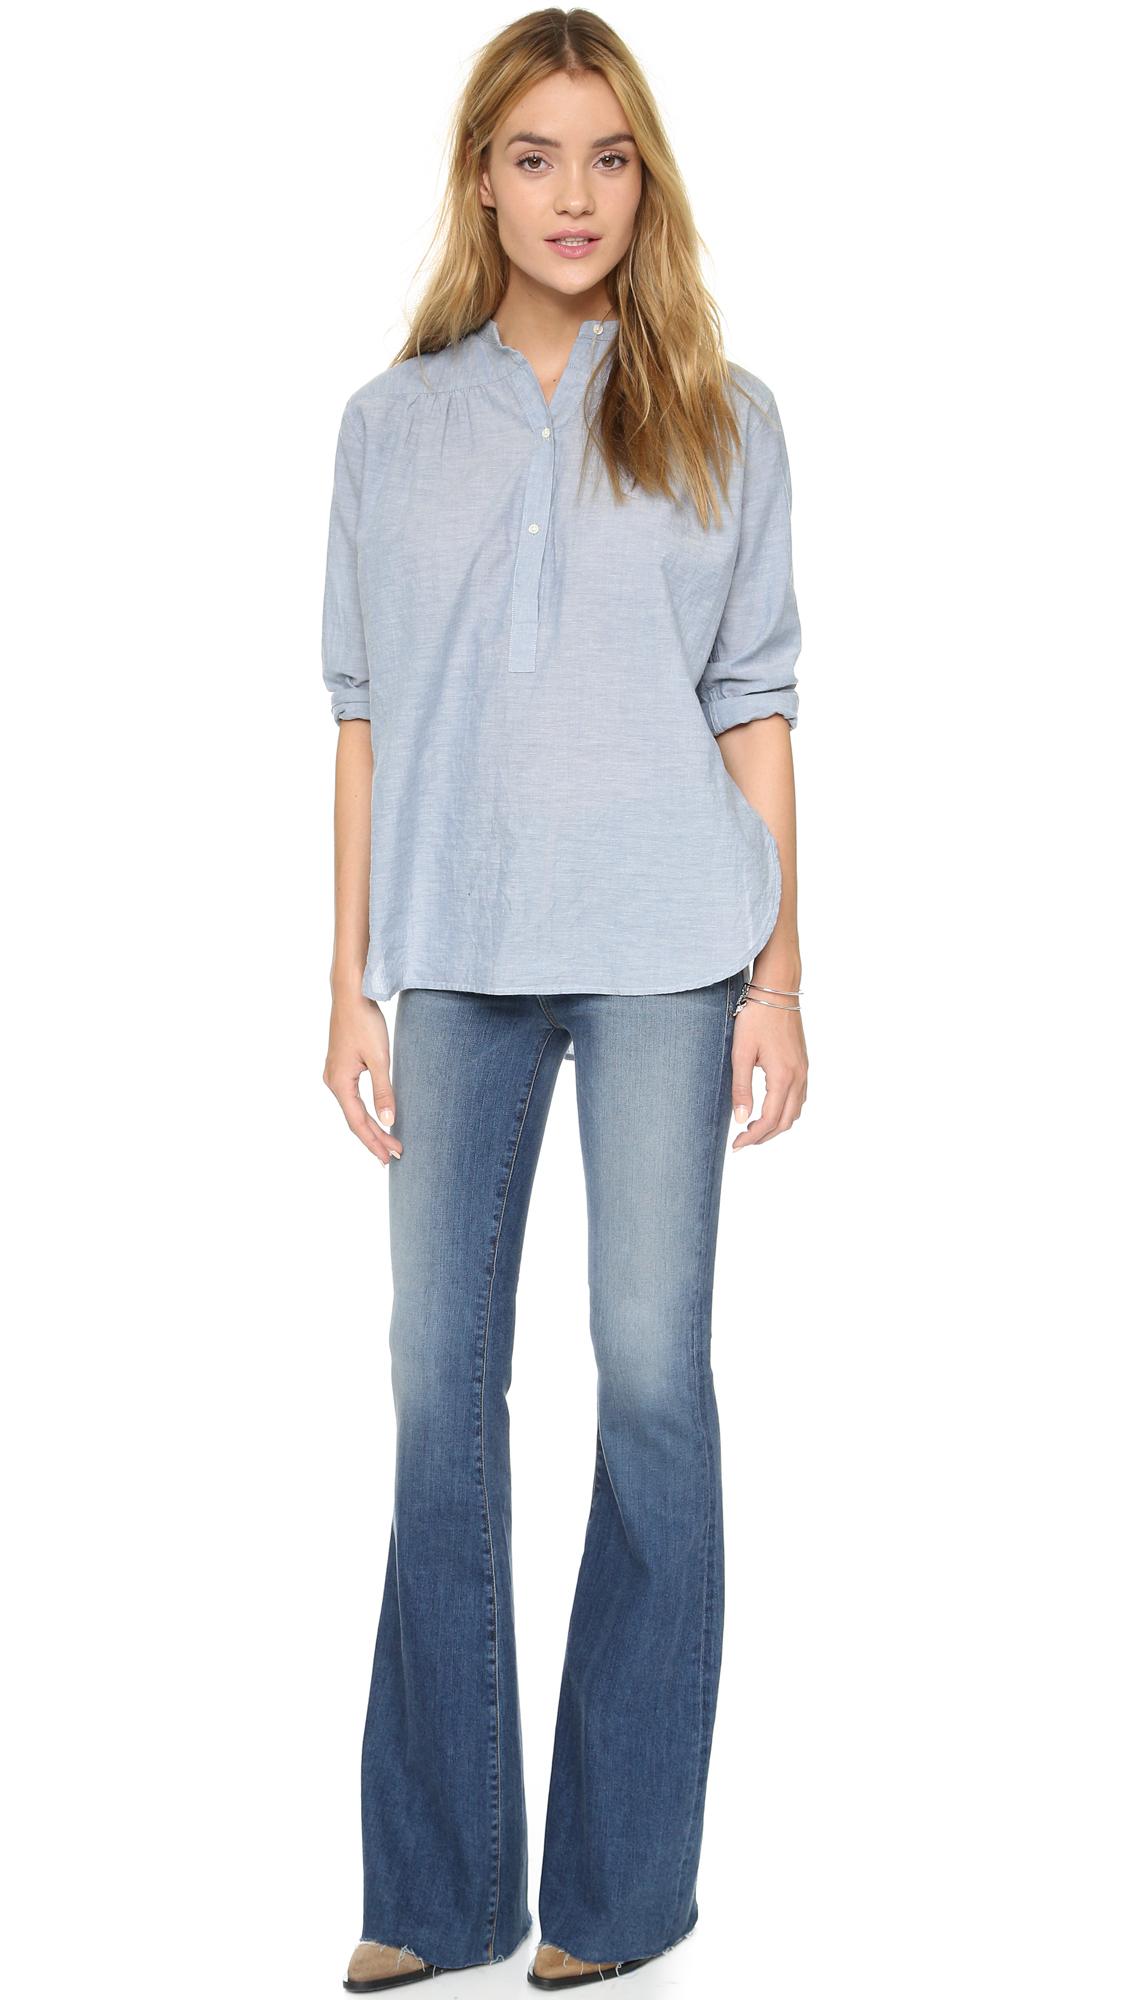 Mcguire Denim Majorelle Flare Jeans In Blue